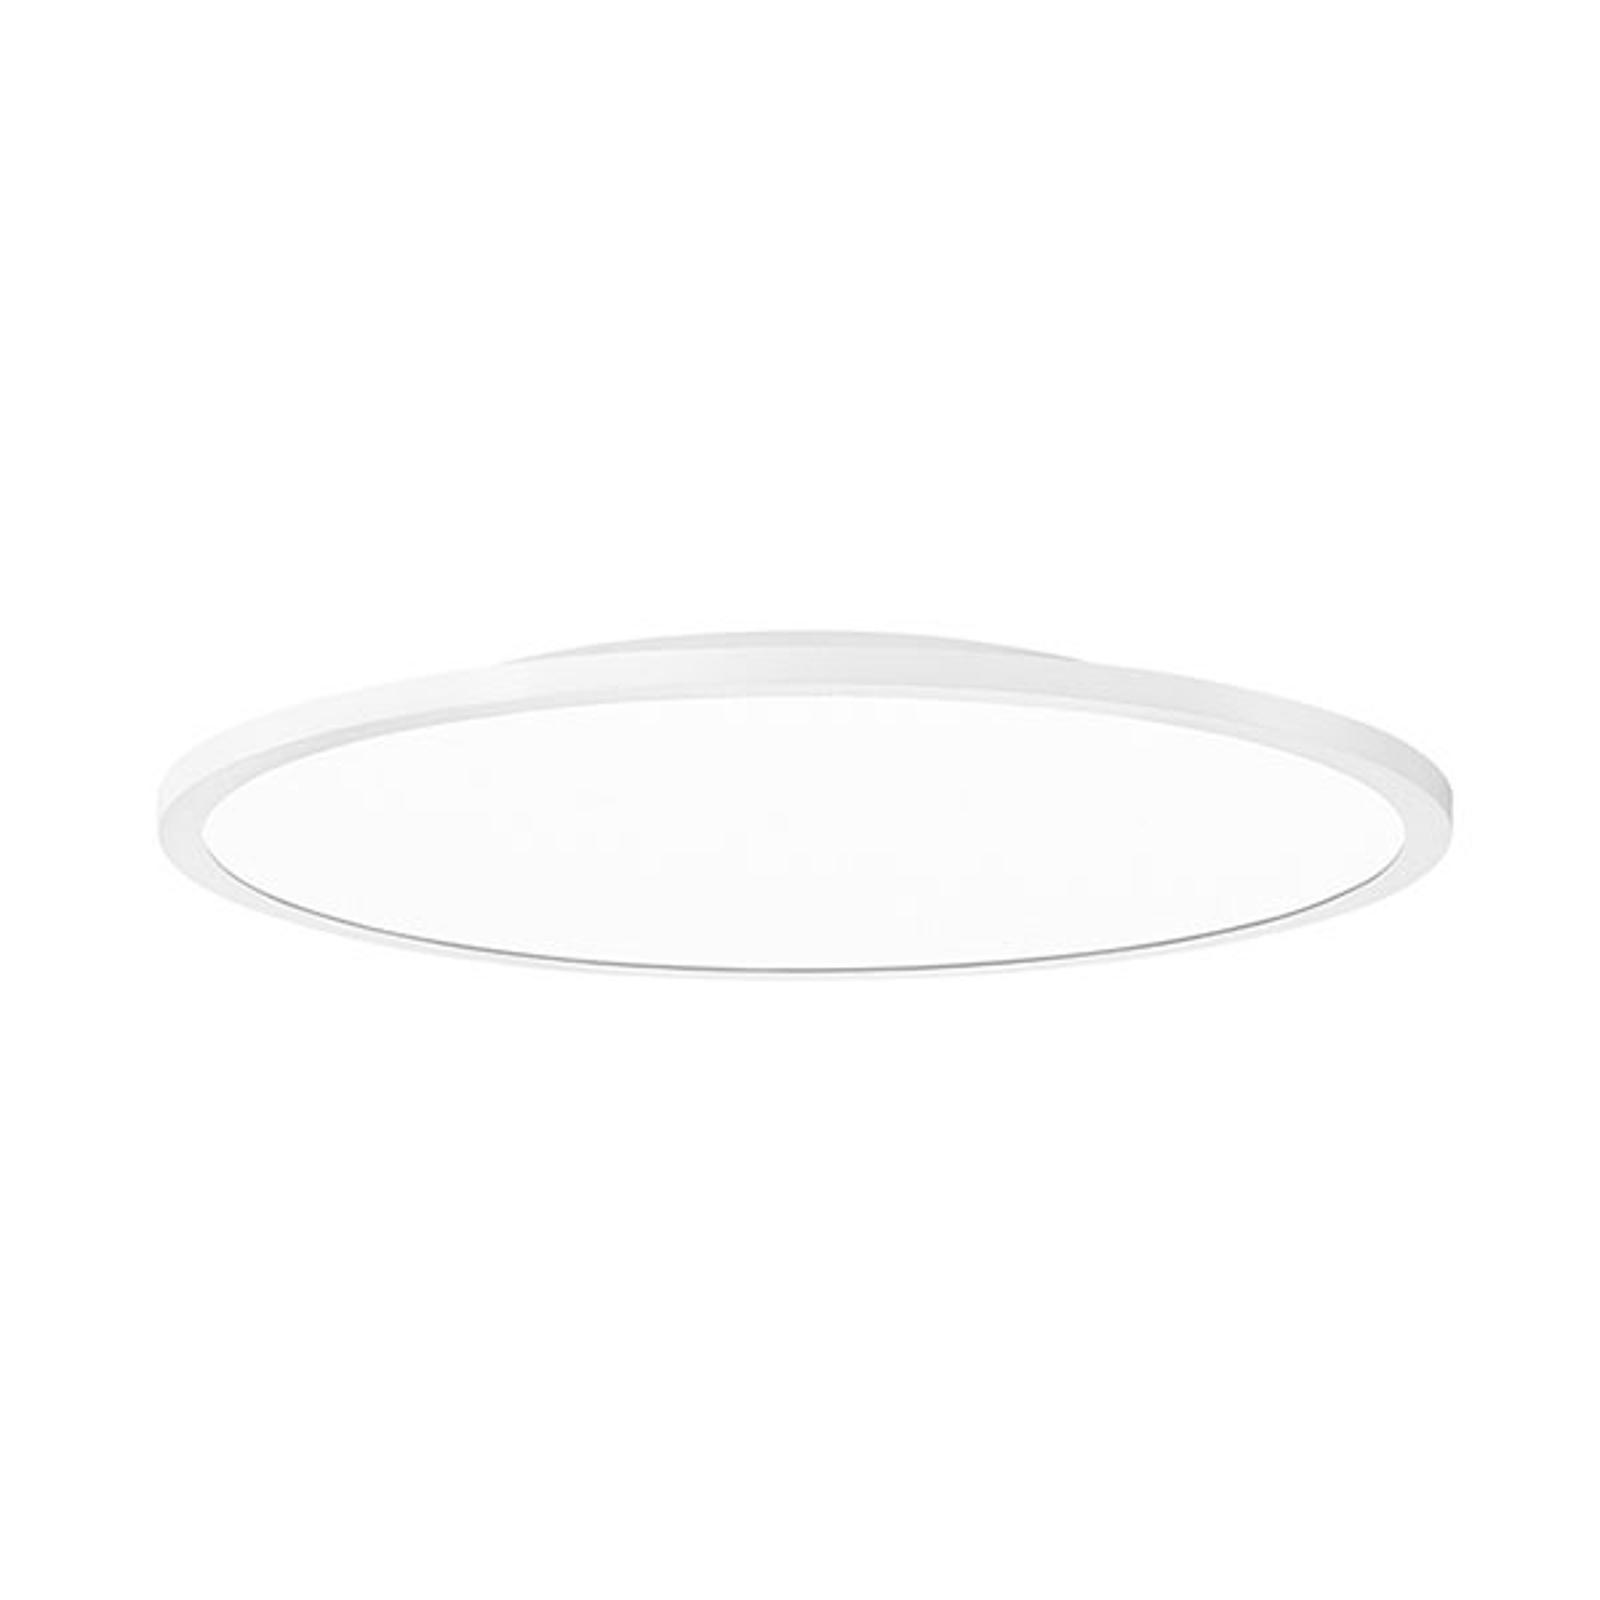 LED-taklampe FL555AB Ø55cm DALI 6500lm 4000K